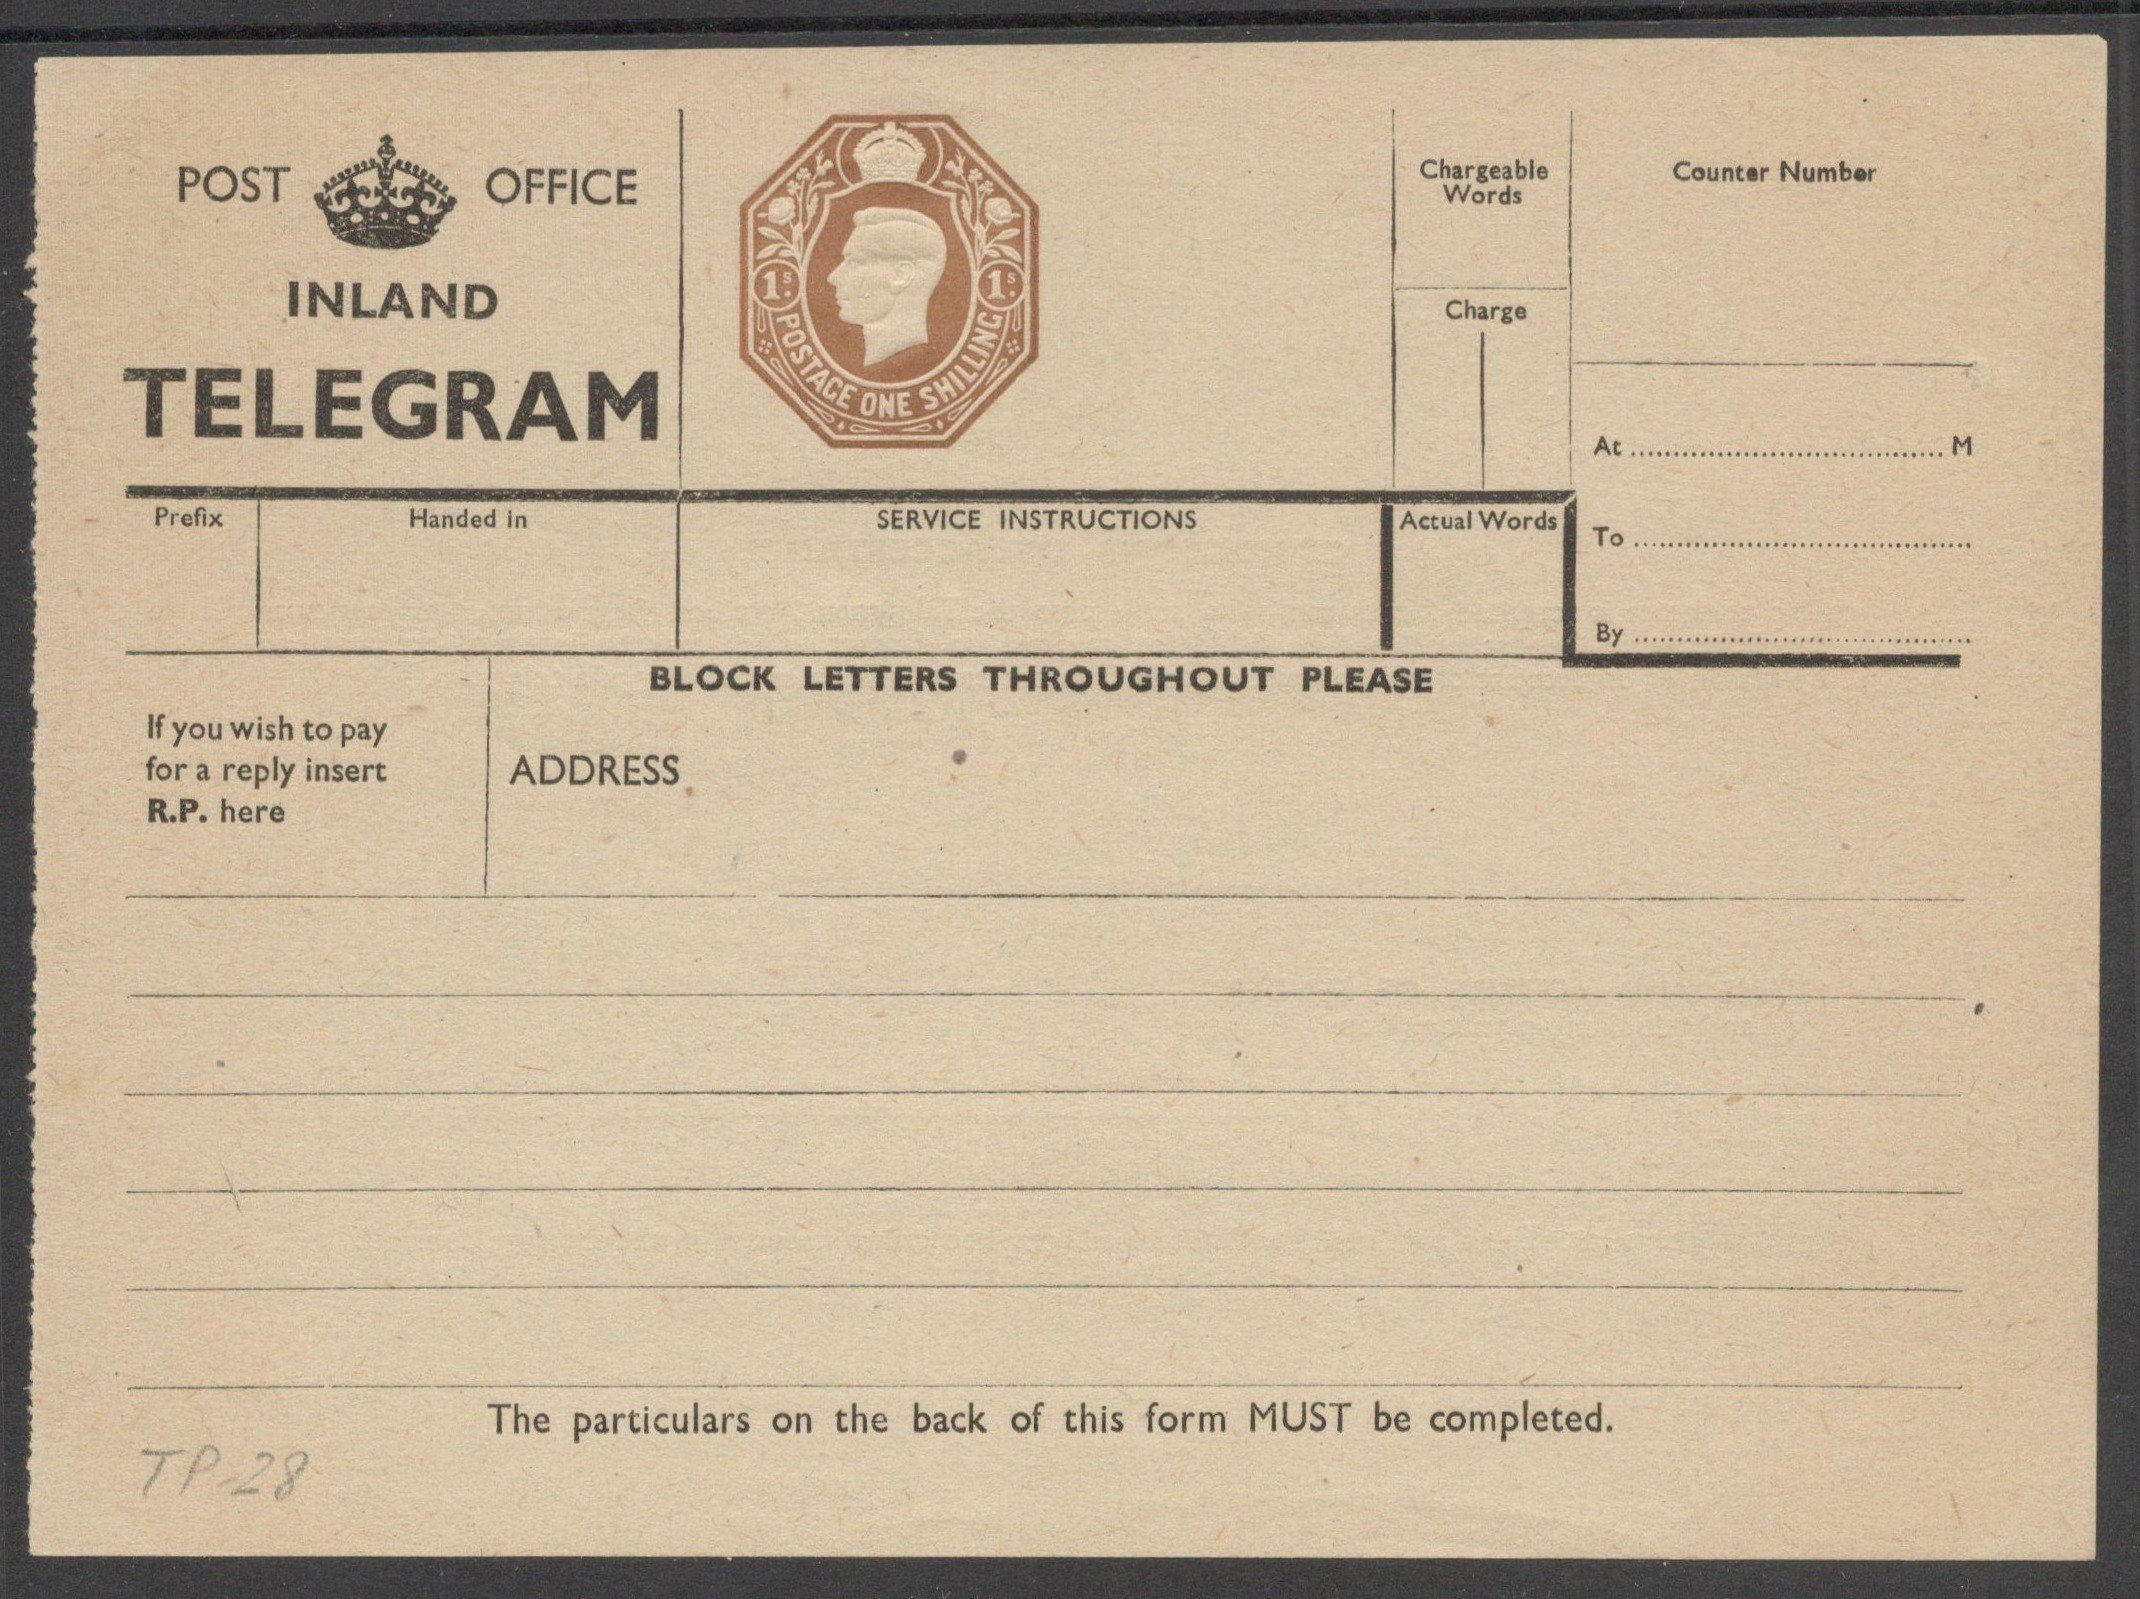 Lot 24 - POST OFFICE INLAND TELEGRAM 1940 KGVI TELEGRAPH FORM 1 SHILLING TP28